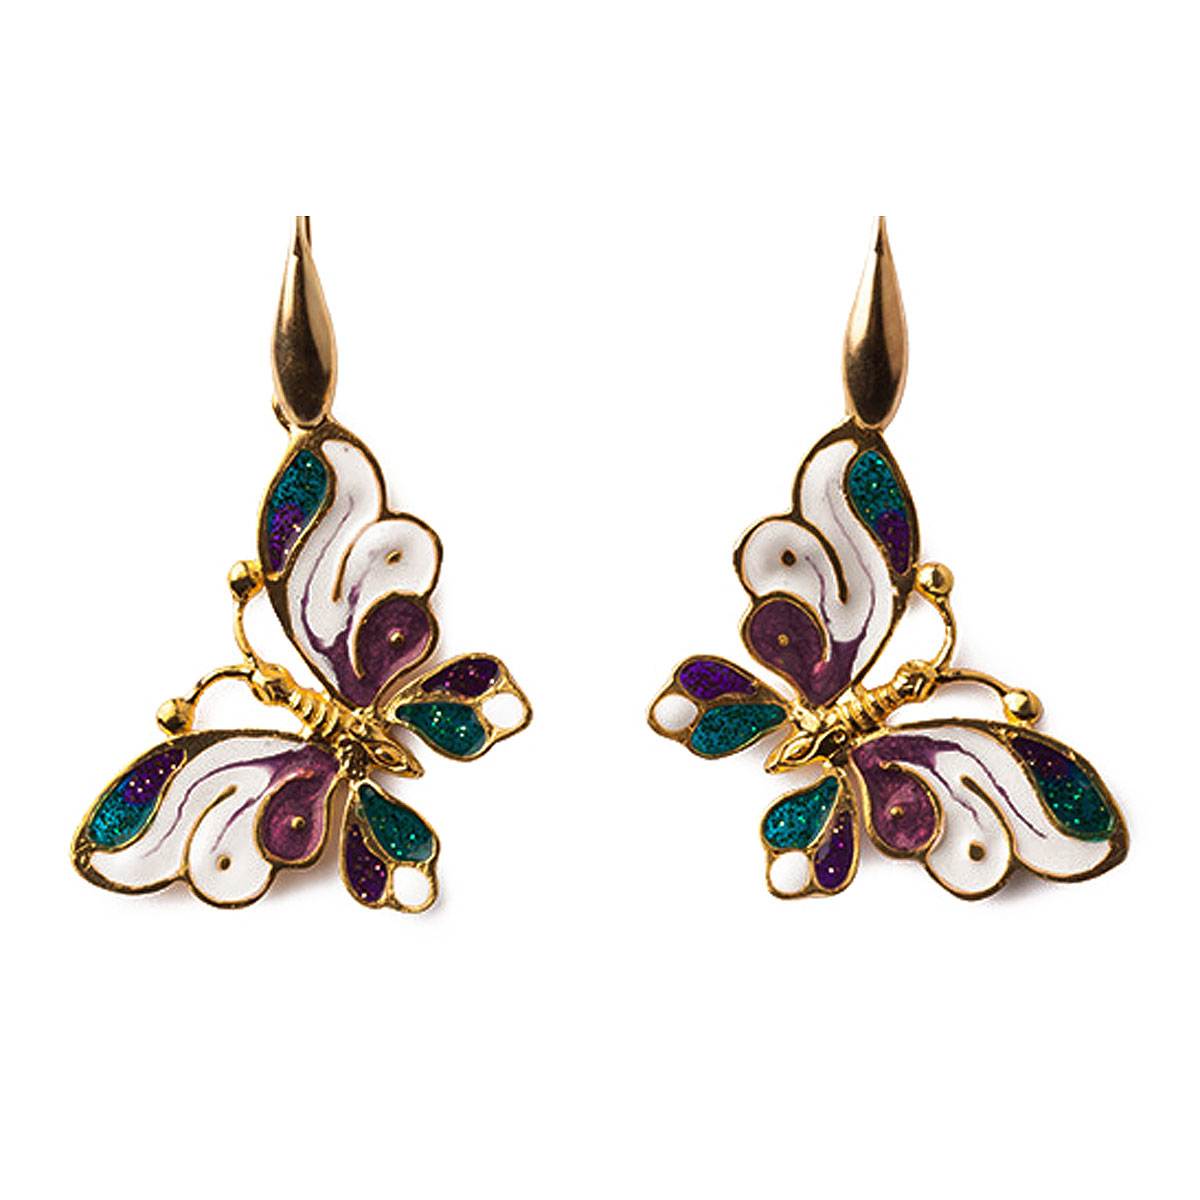 Image of Isola Bella Earrings for Women, Gold, Silk, 2017